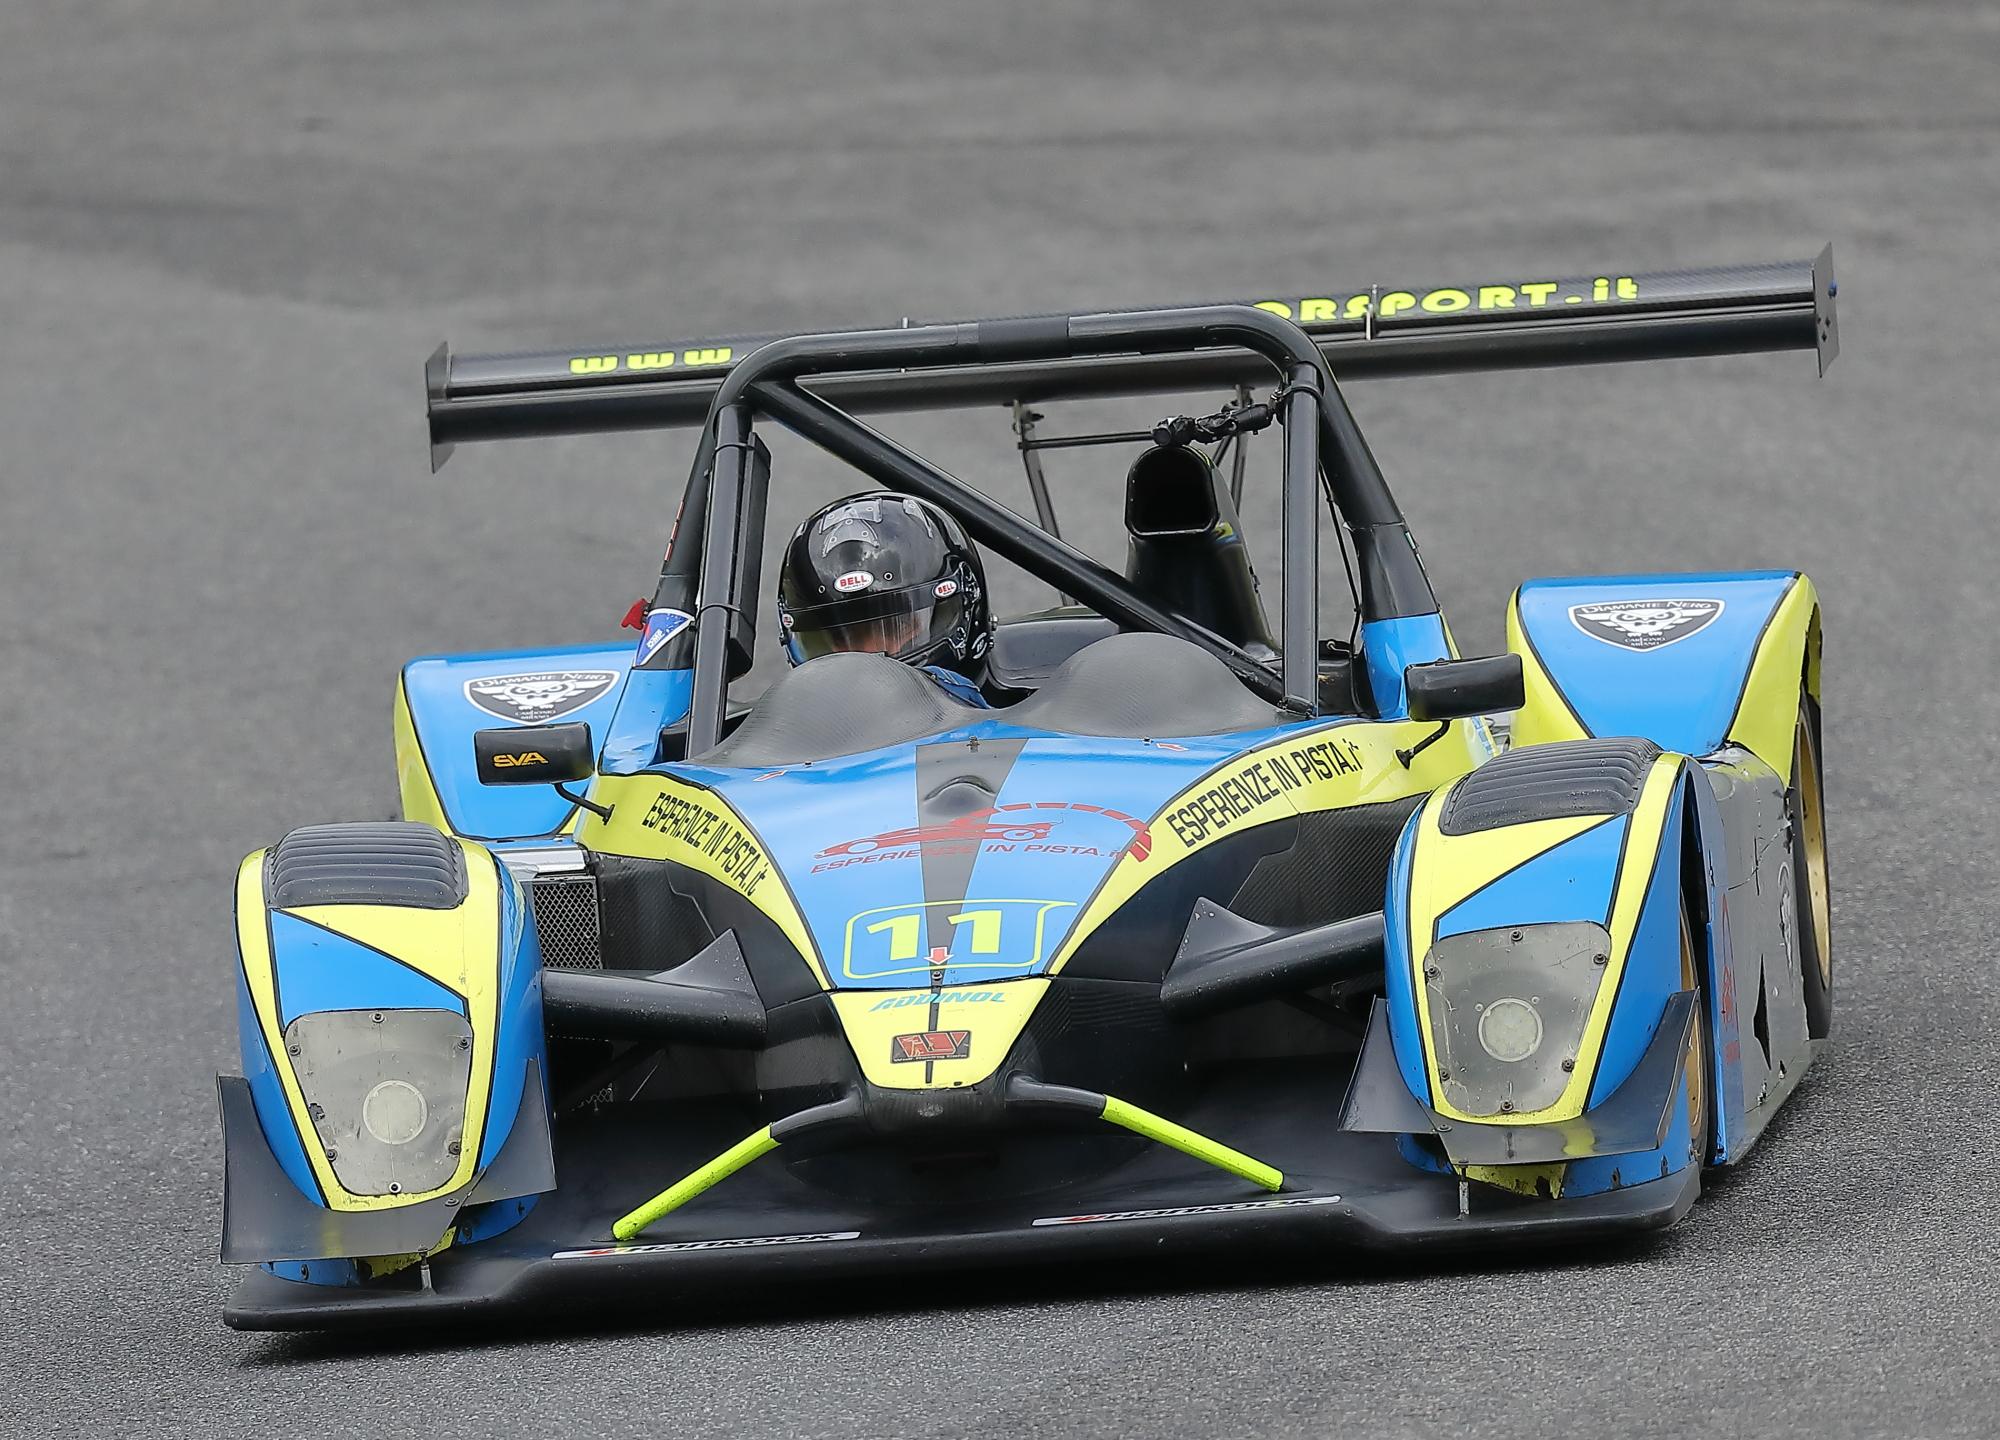 Mugello - 12/04/2019 - Peroni Race...